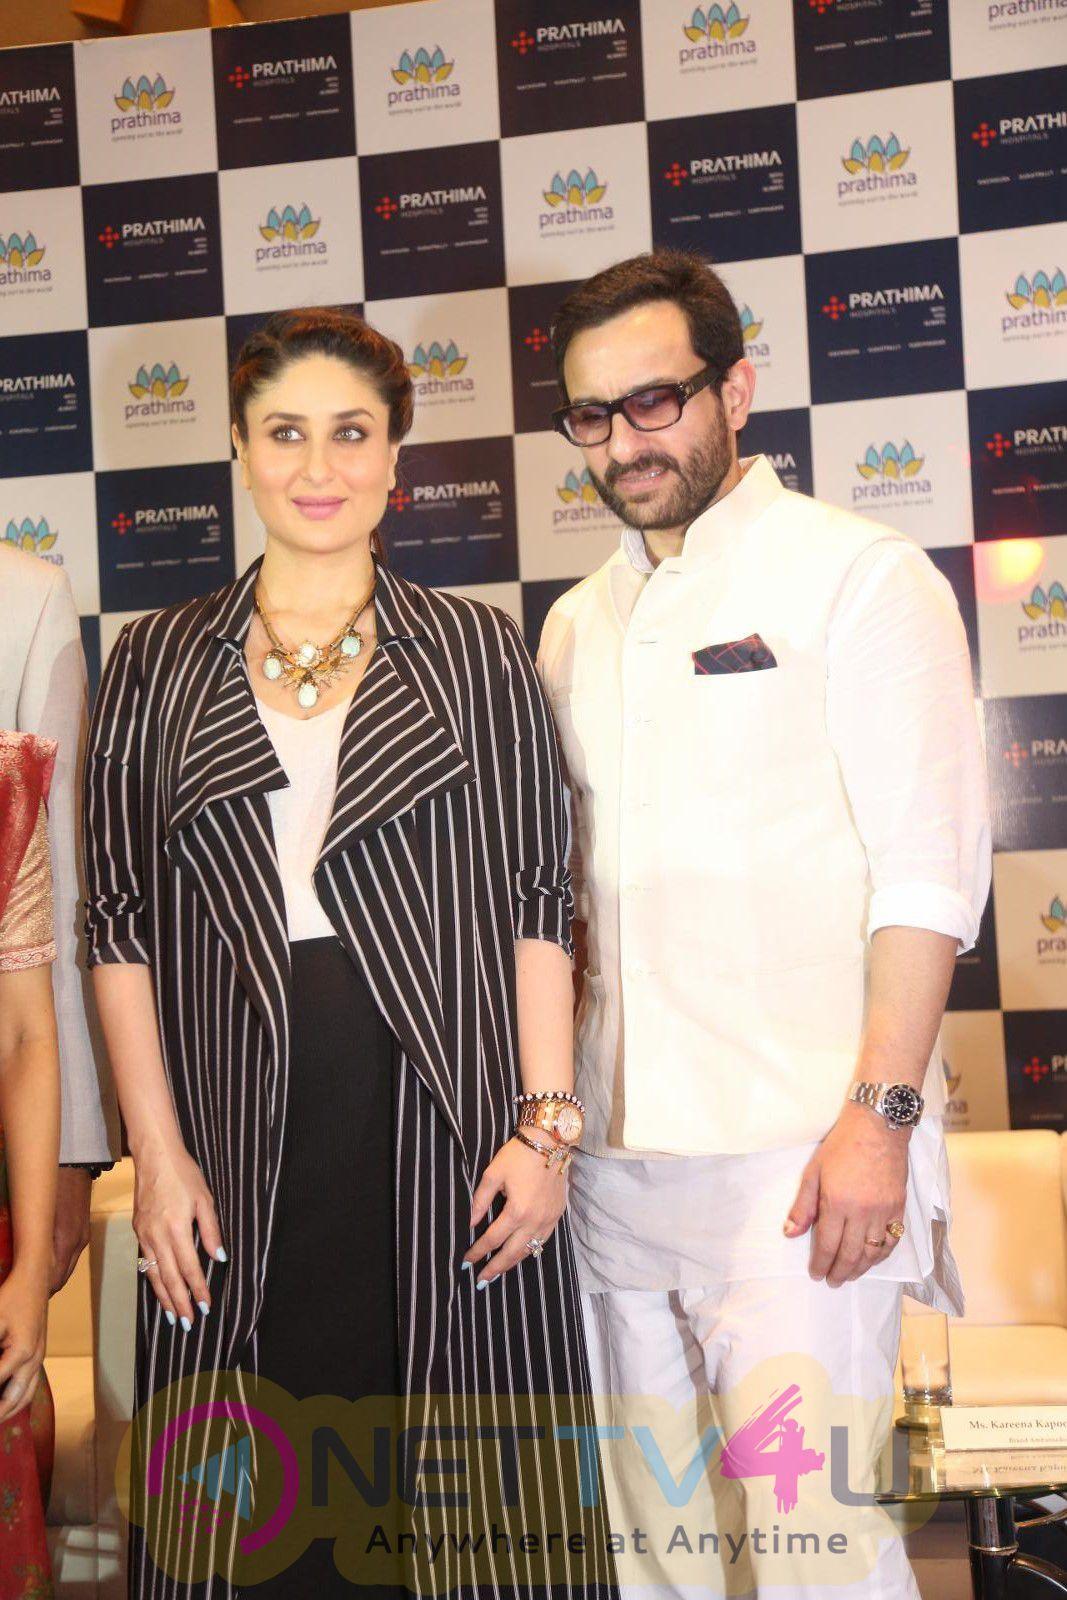 Bollywood Couple Saif Ali Khan And Kareena Kapoor Visited Prathima Hospital Photos